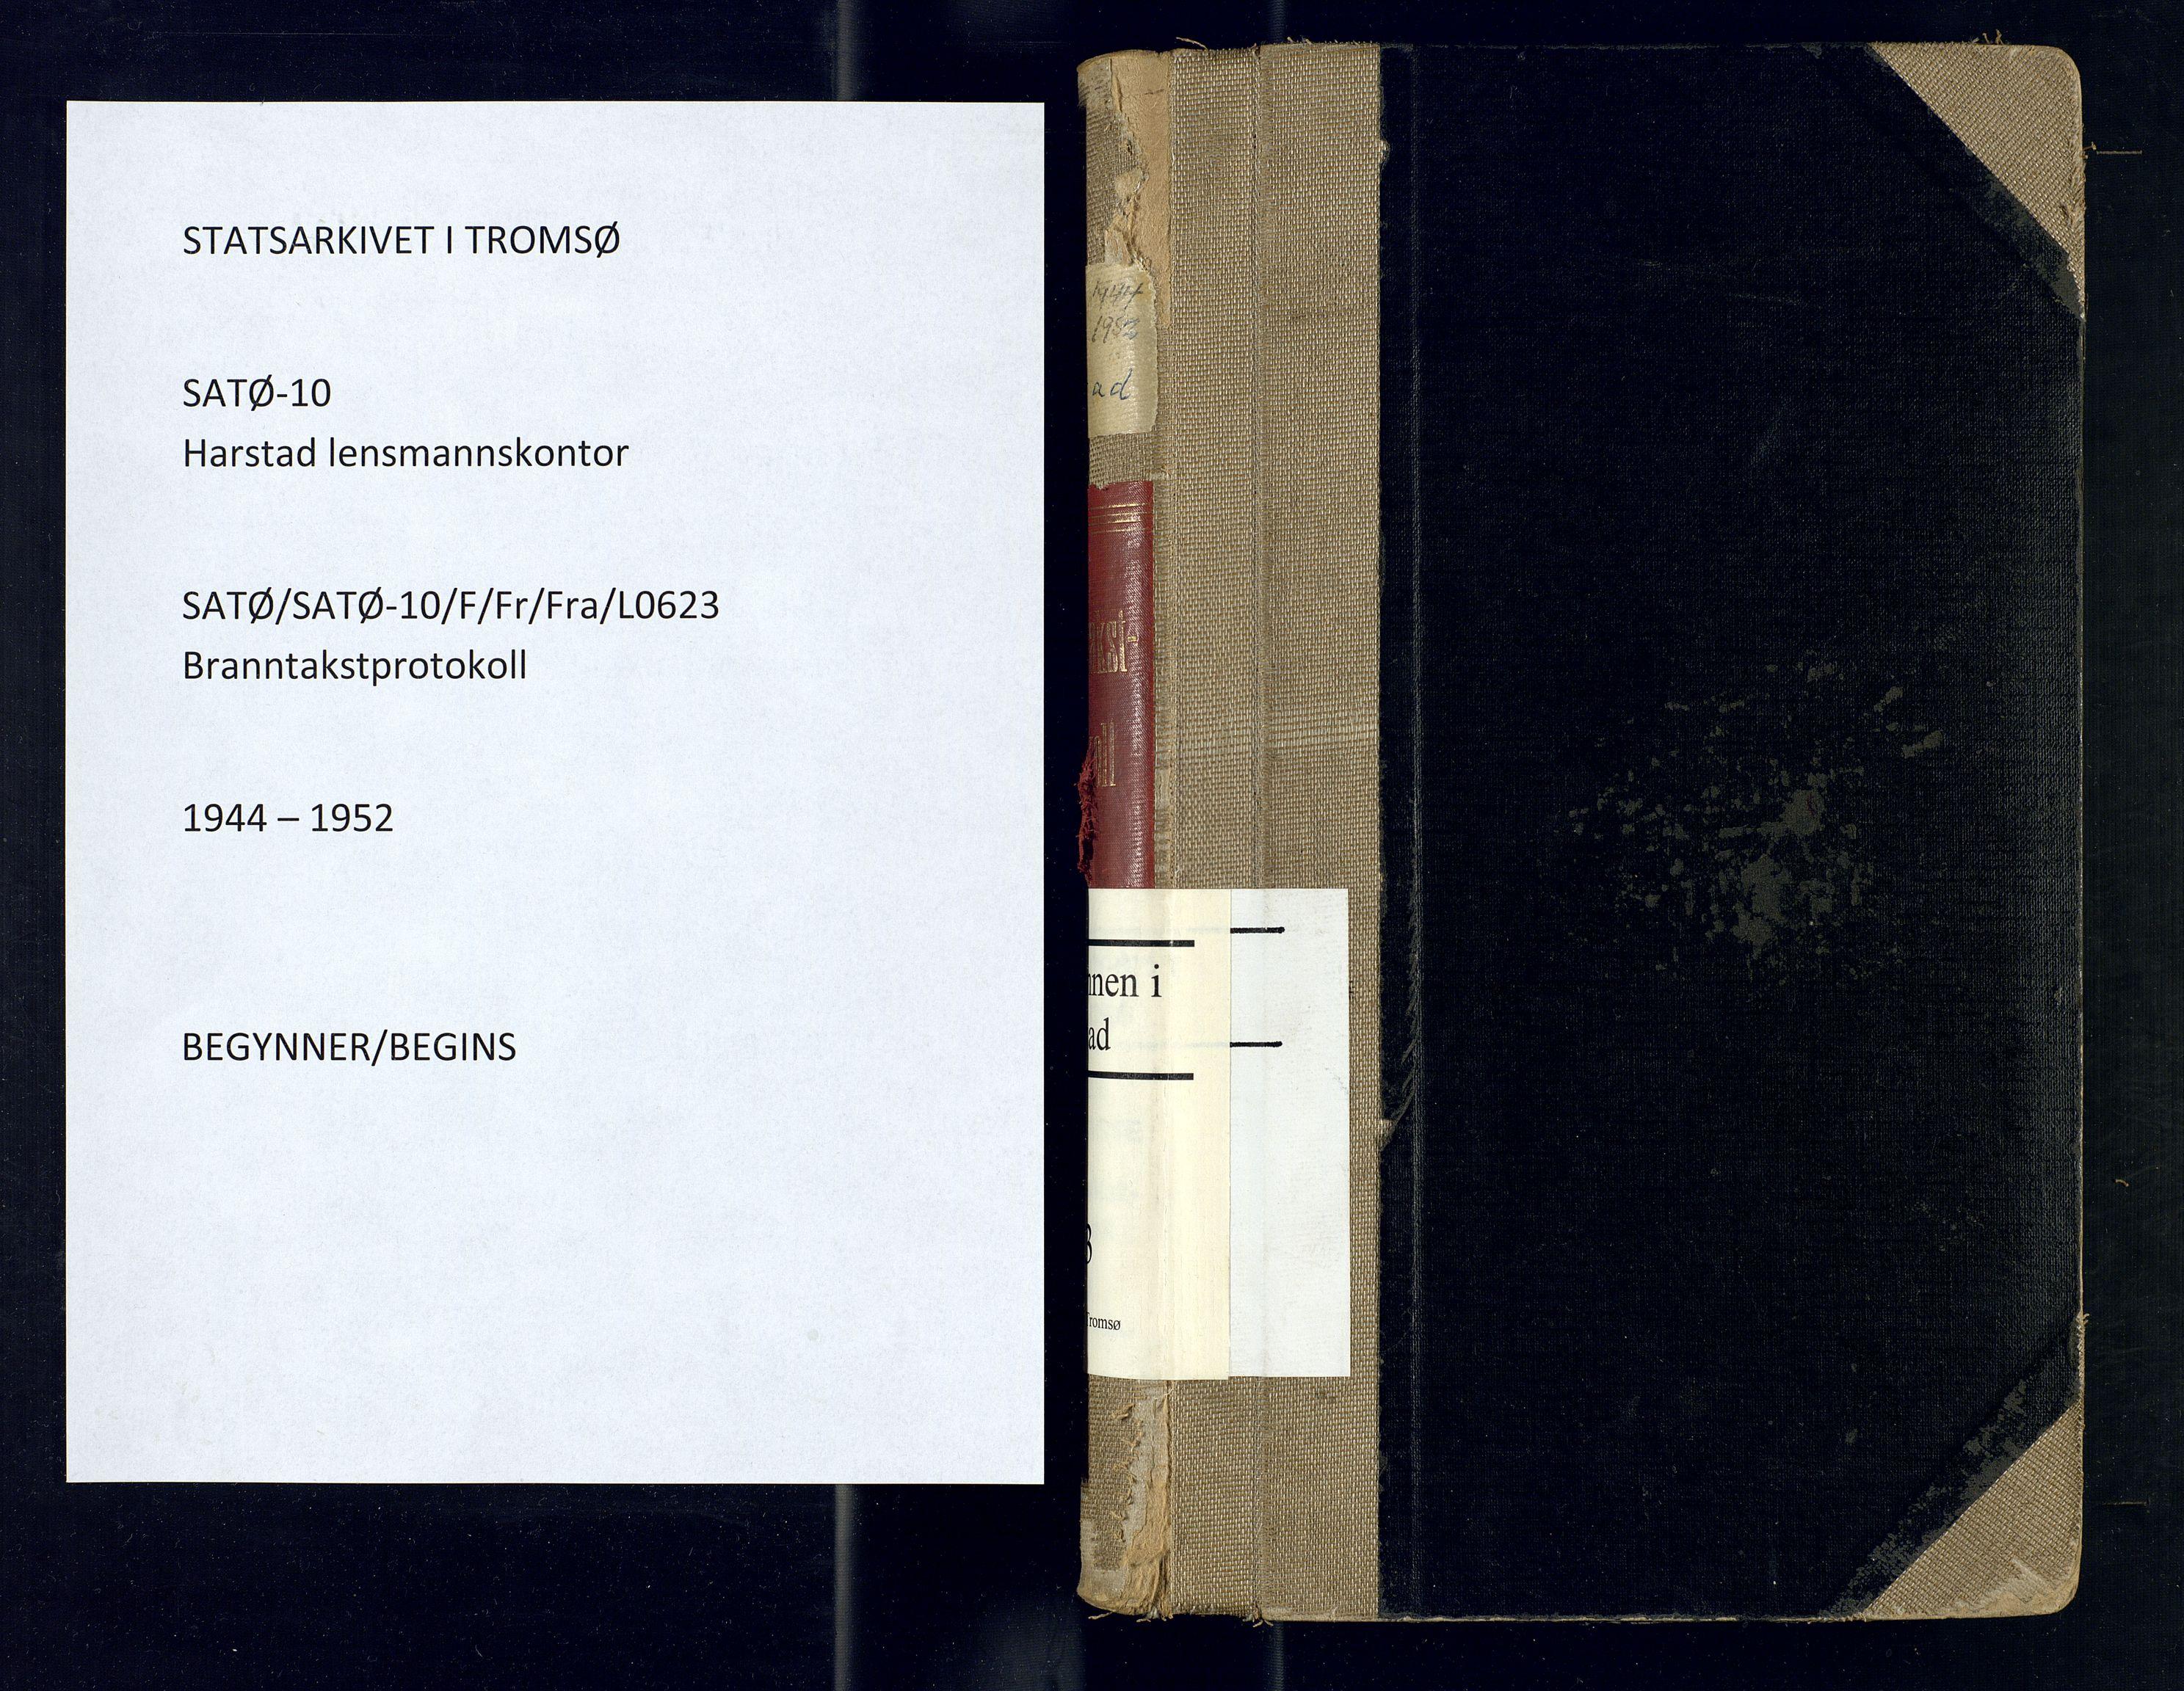 SATØ, Harstad lensmannskontor, F/Fr/Fra/L0623: Branntakstprotokoll. Autorisert for Harstad by, 1944-1952